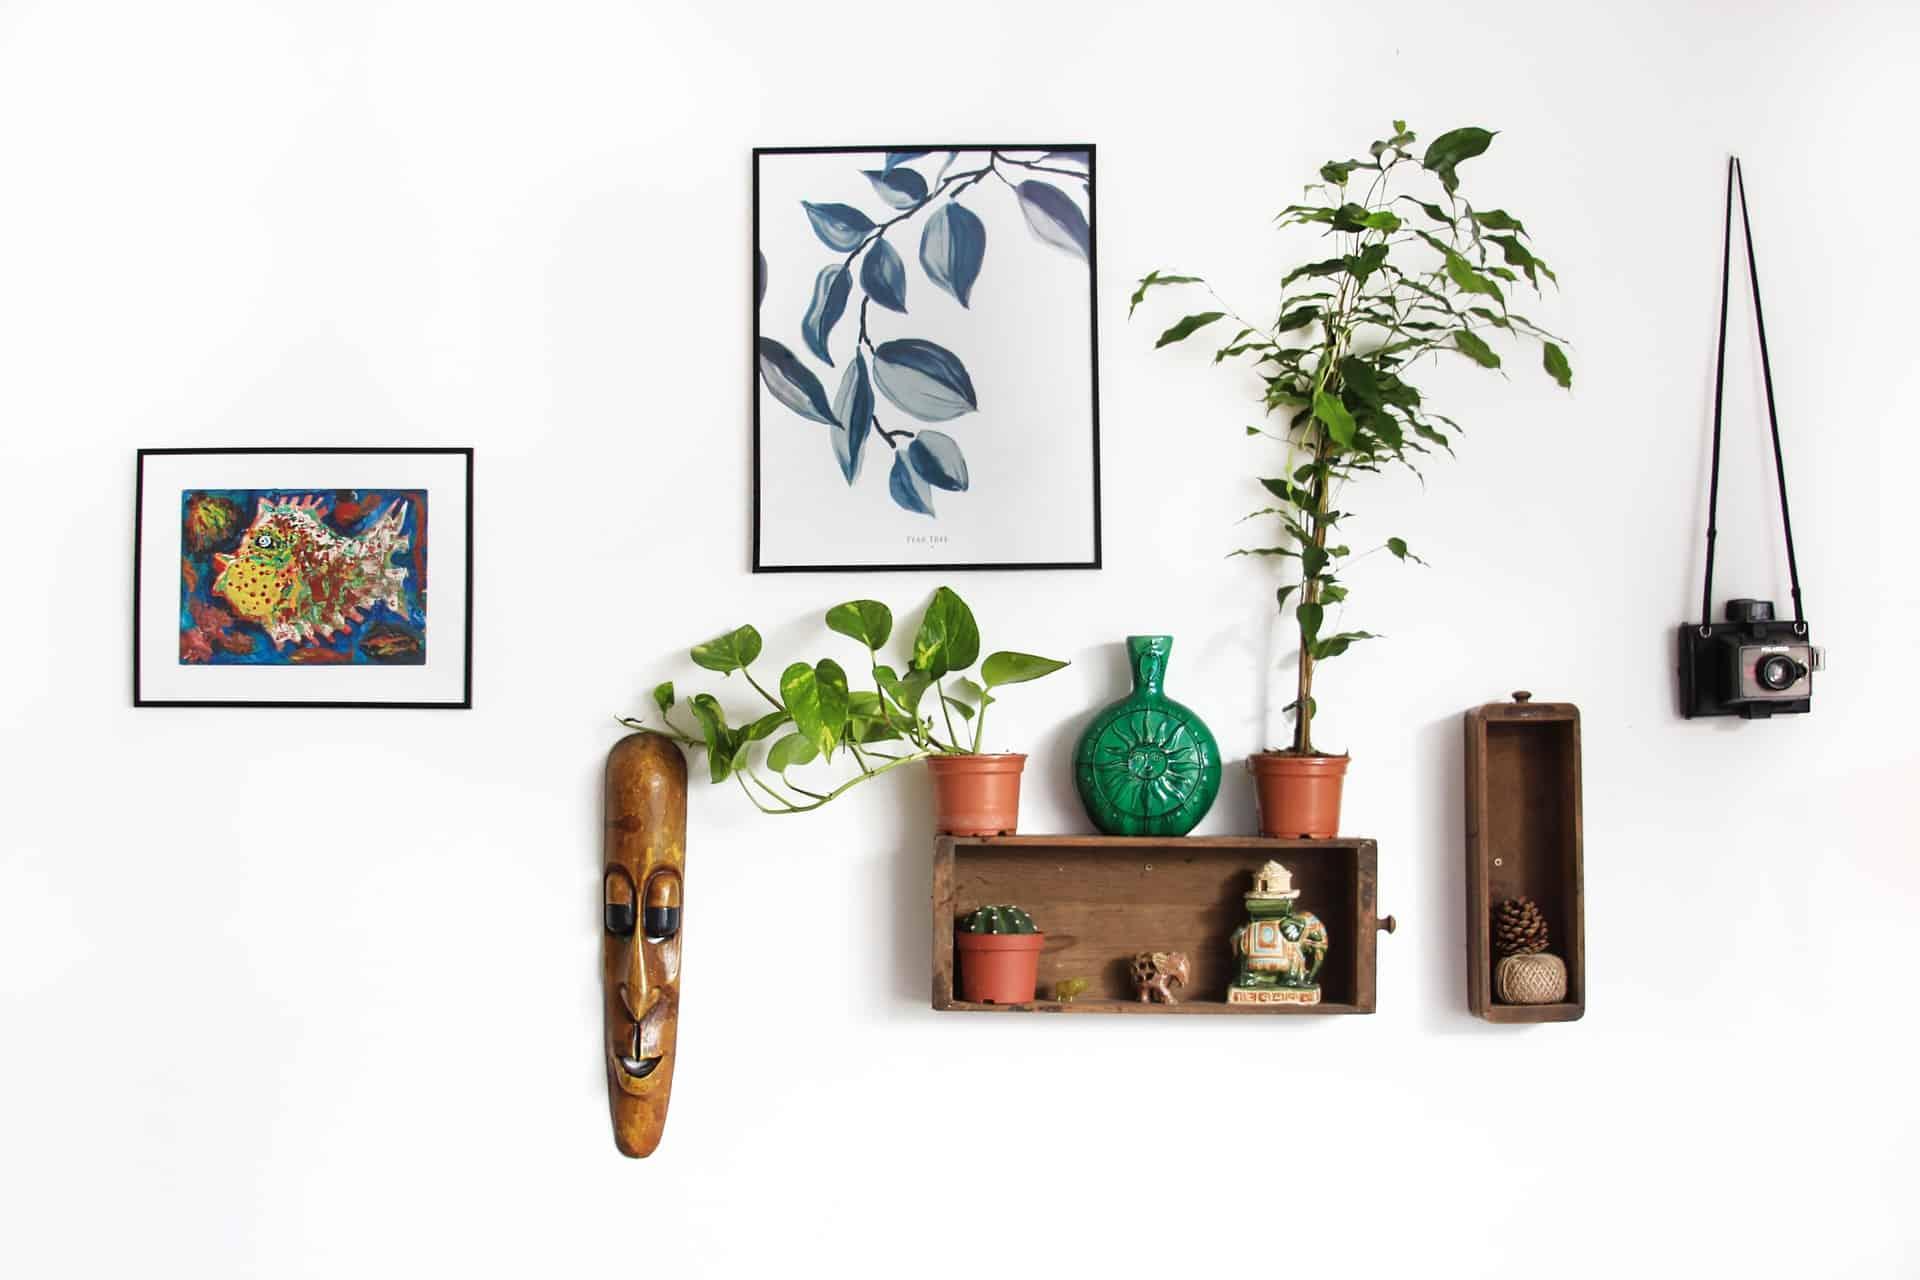 digital photo frame wall